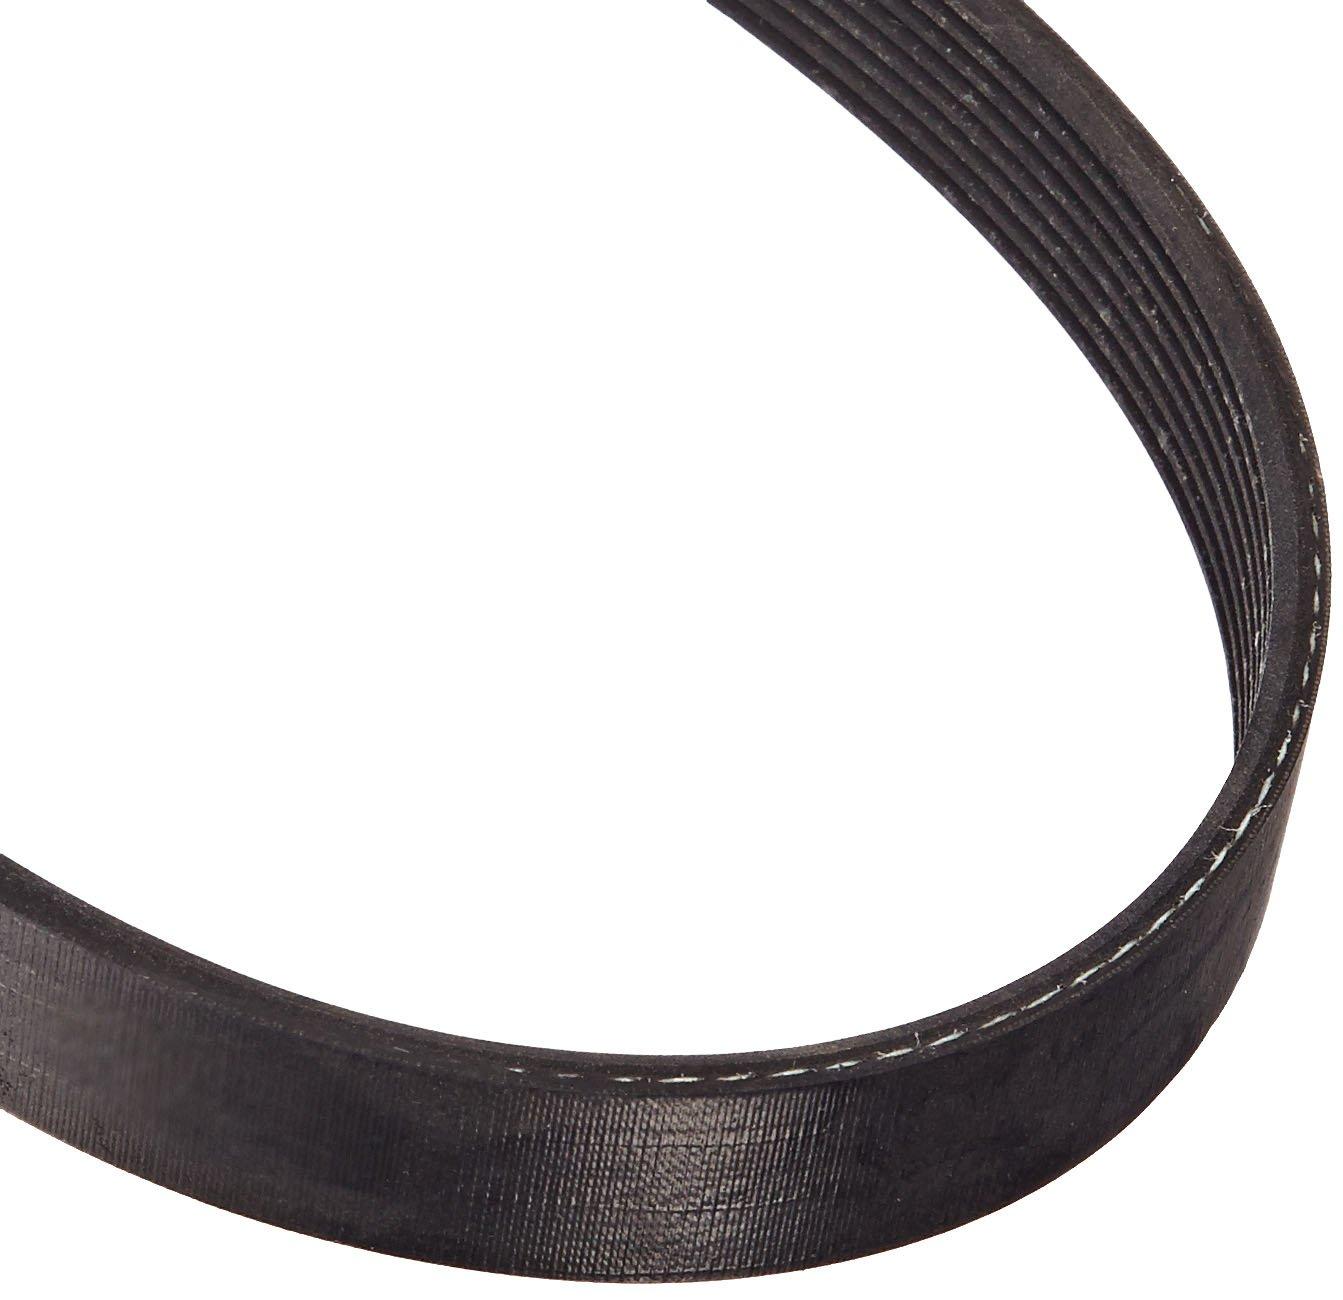 Gates 190J8 Micro-V Belt, J Section, 190J Size, 19' Length, 3/4' Width, 8 Rib 19 Length 3/4 Width 917101908